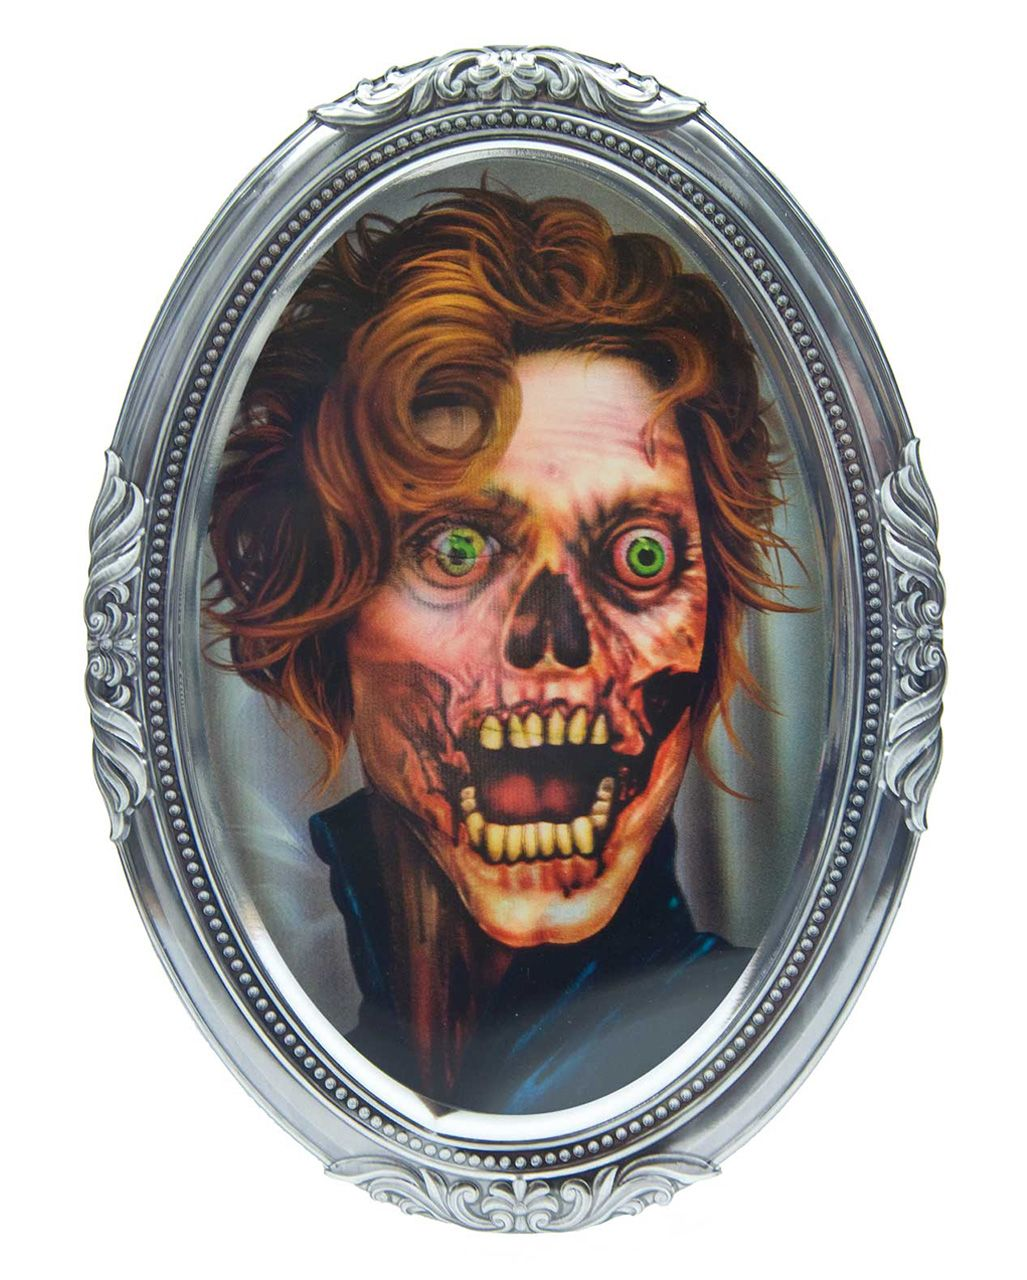 3d_wackelbild_totenkopf-halloween_dekoration-horror_wanddekoration-lenticular_effekt_bild-wall_image_skull-26423-3.jpg (1027×1280)